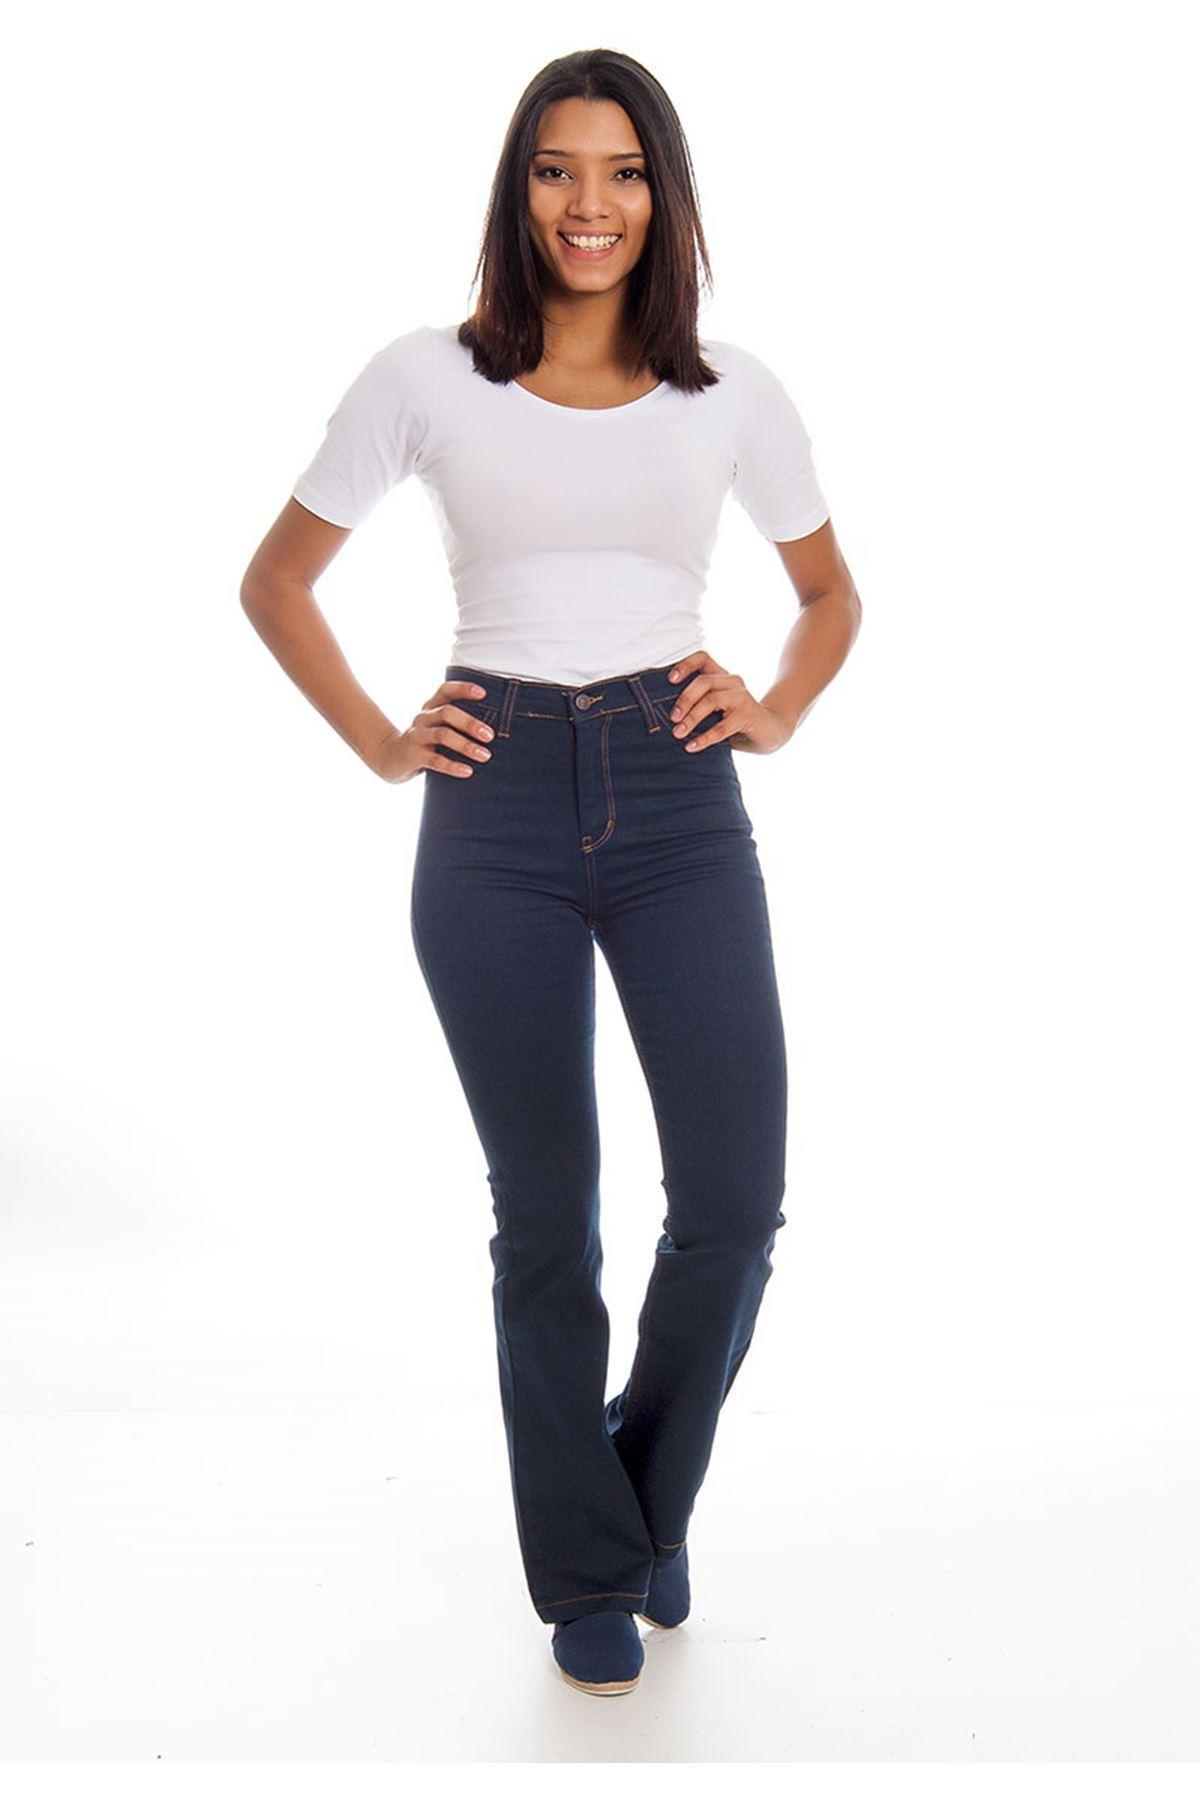 Lacivert İspanyol Paça Yüksek Bel Kadın Pantolon 5A-126119